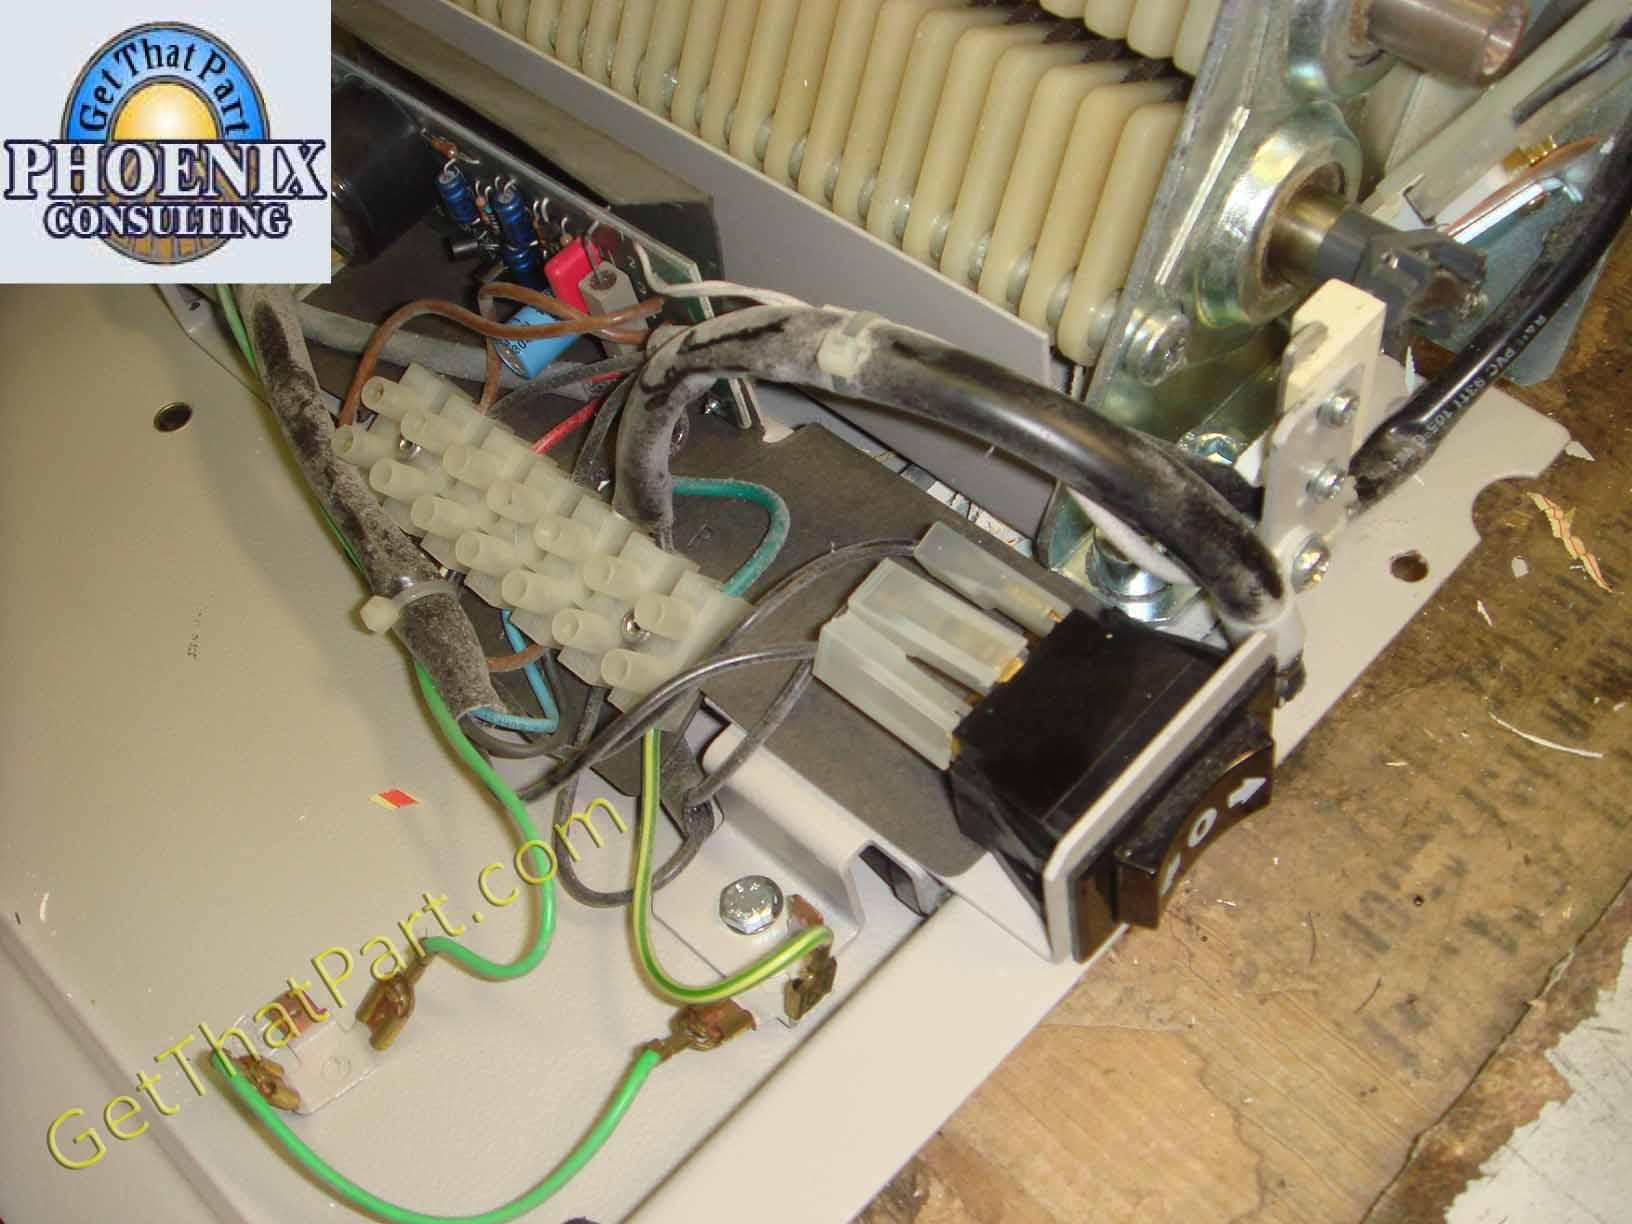 Ideal 3801 1436306 g destroyit 3801 stripcut german m gear industrial paper shredder 4 Wire Motor Wiring Diagram Old at nearapp.co